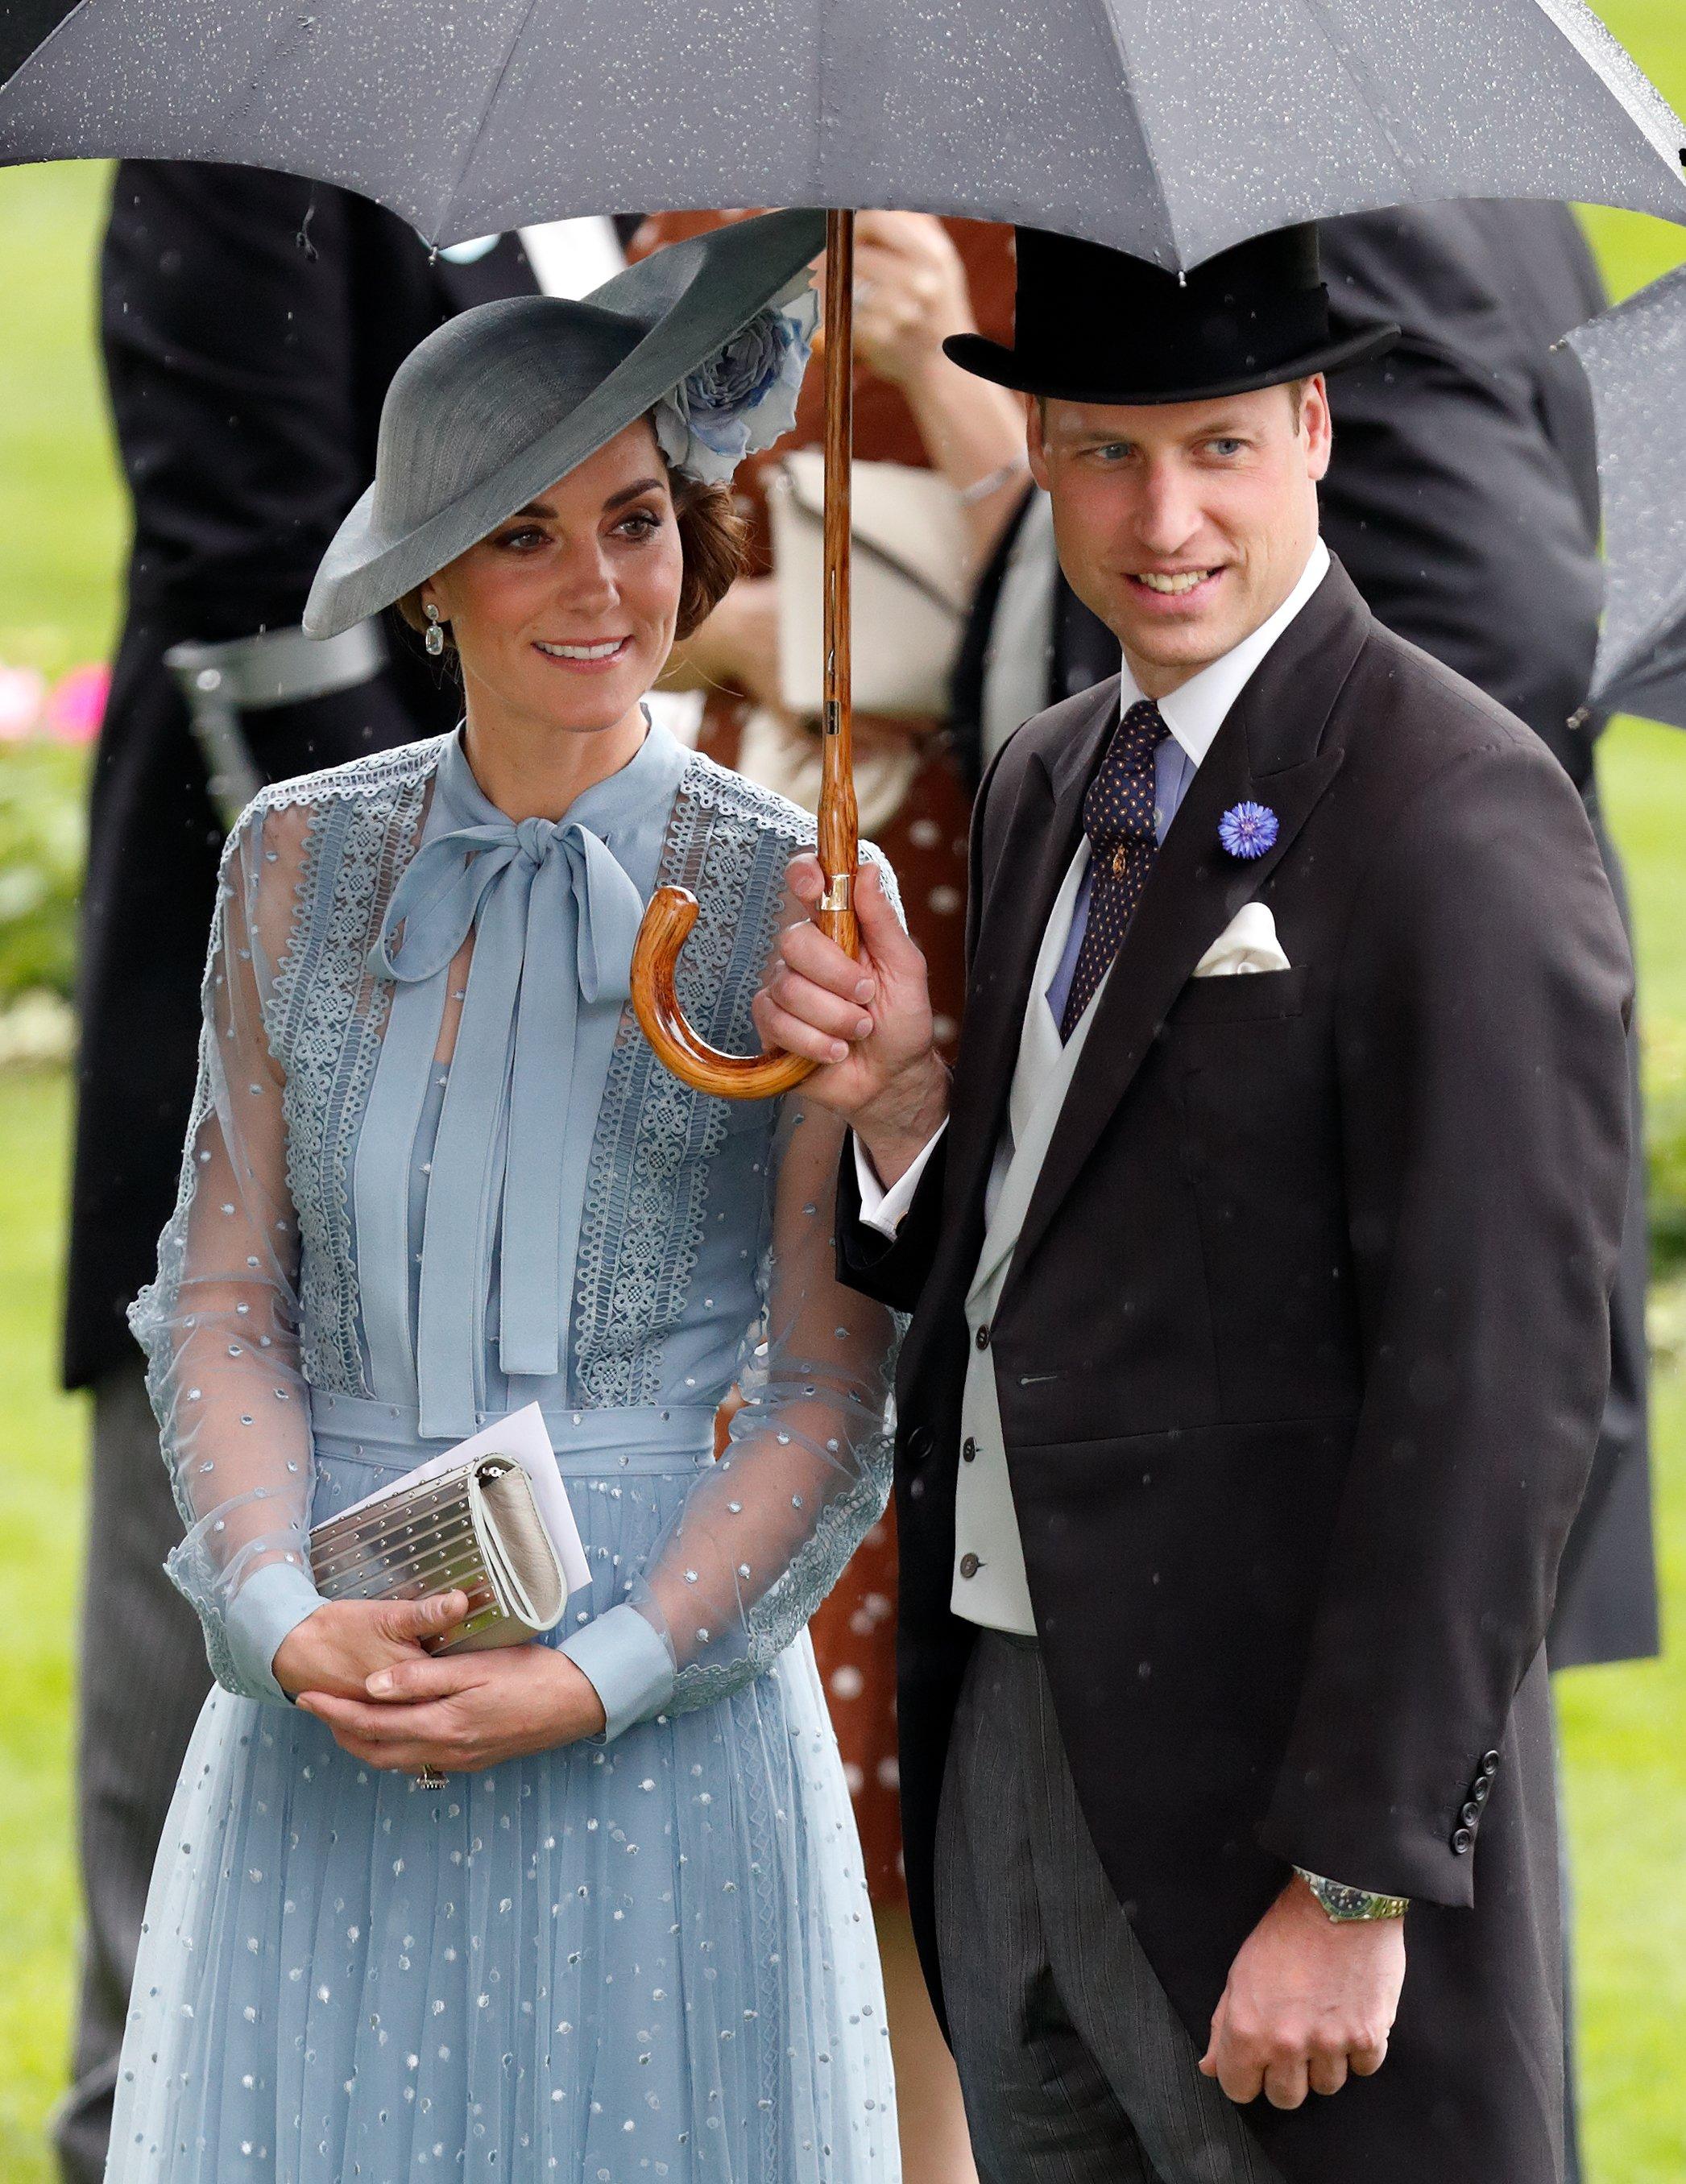 Prince William et Duchesse Kate au Royal Ascot | Photo : Getty Images